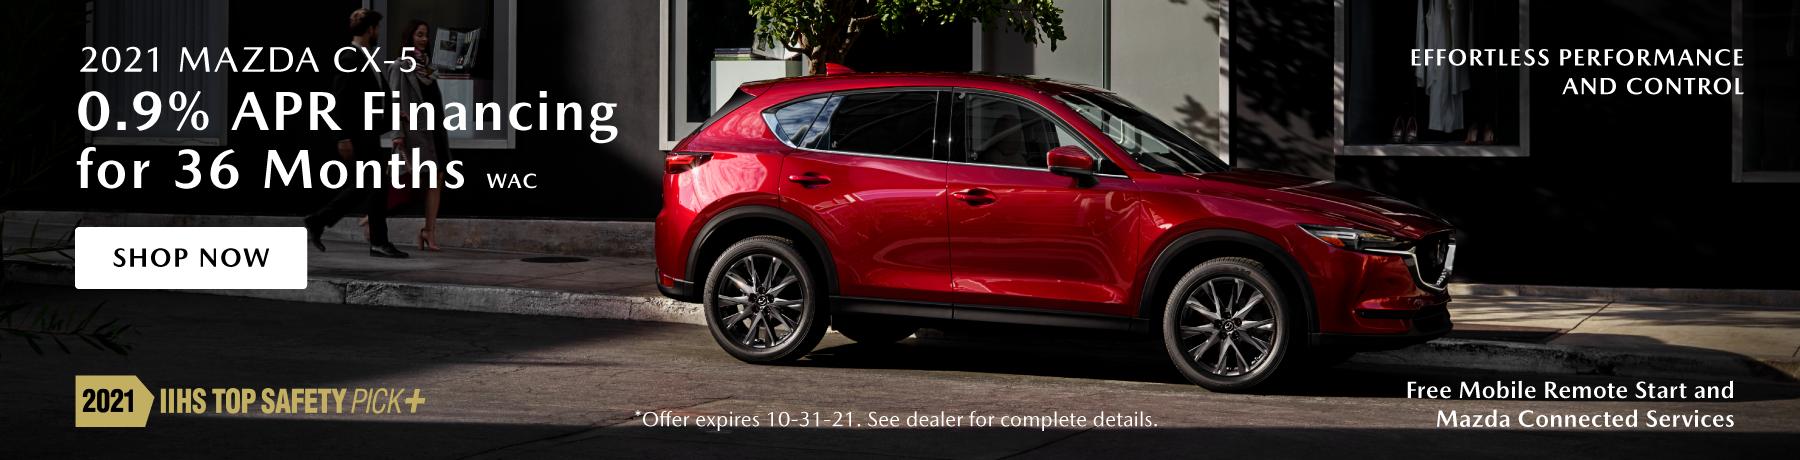 MazdaPlace-OEM-1021_CX5